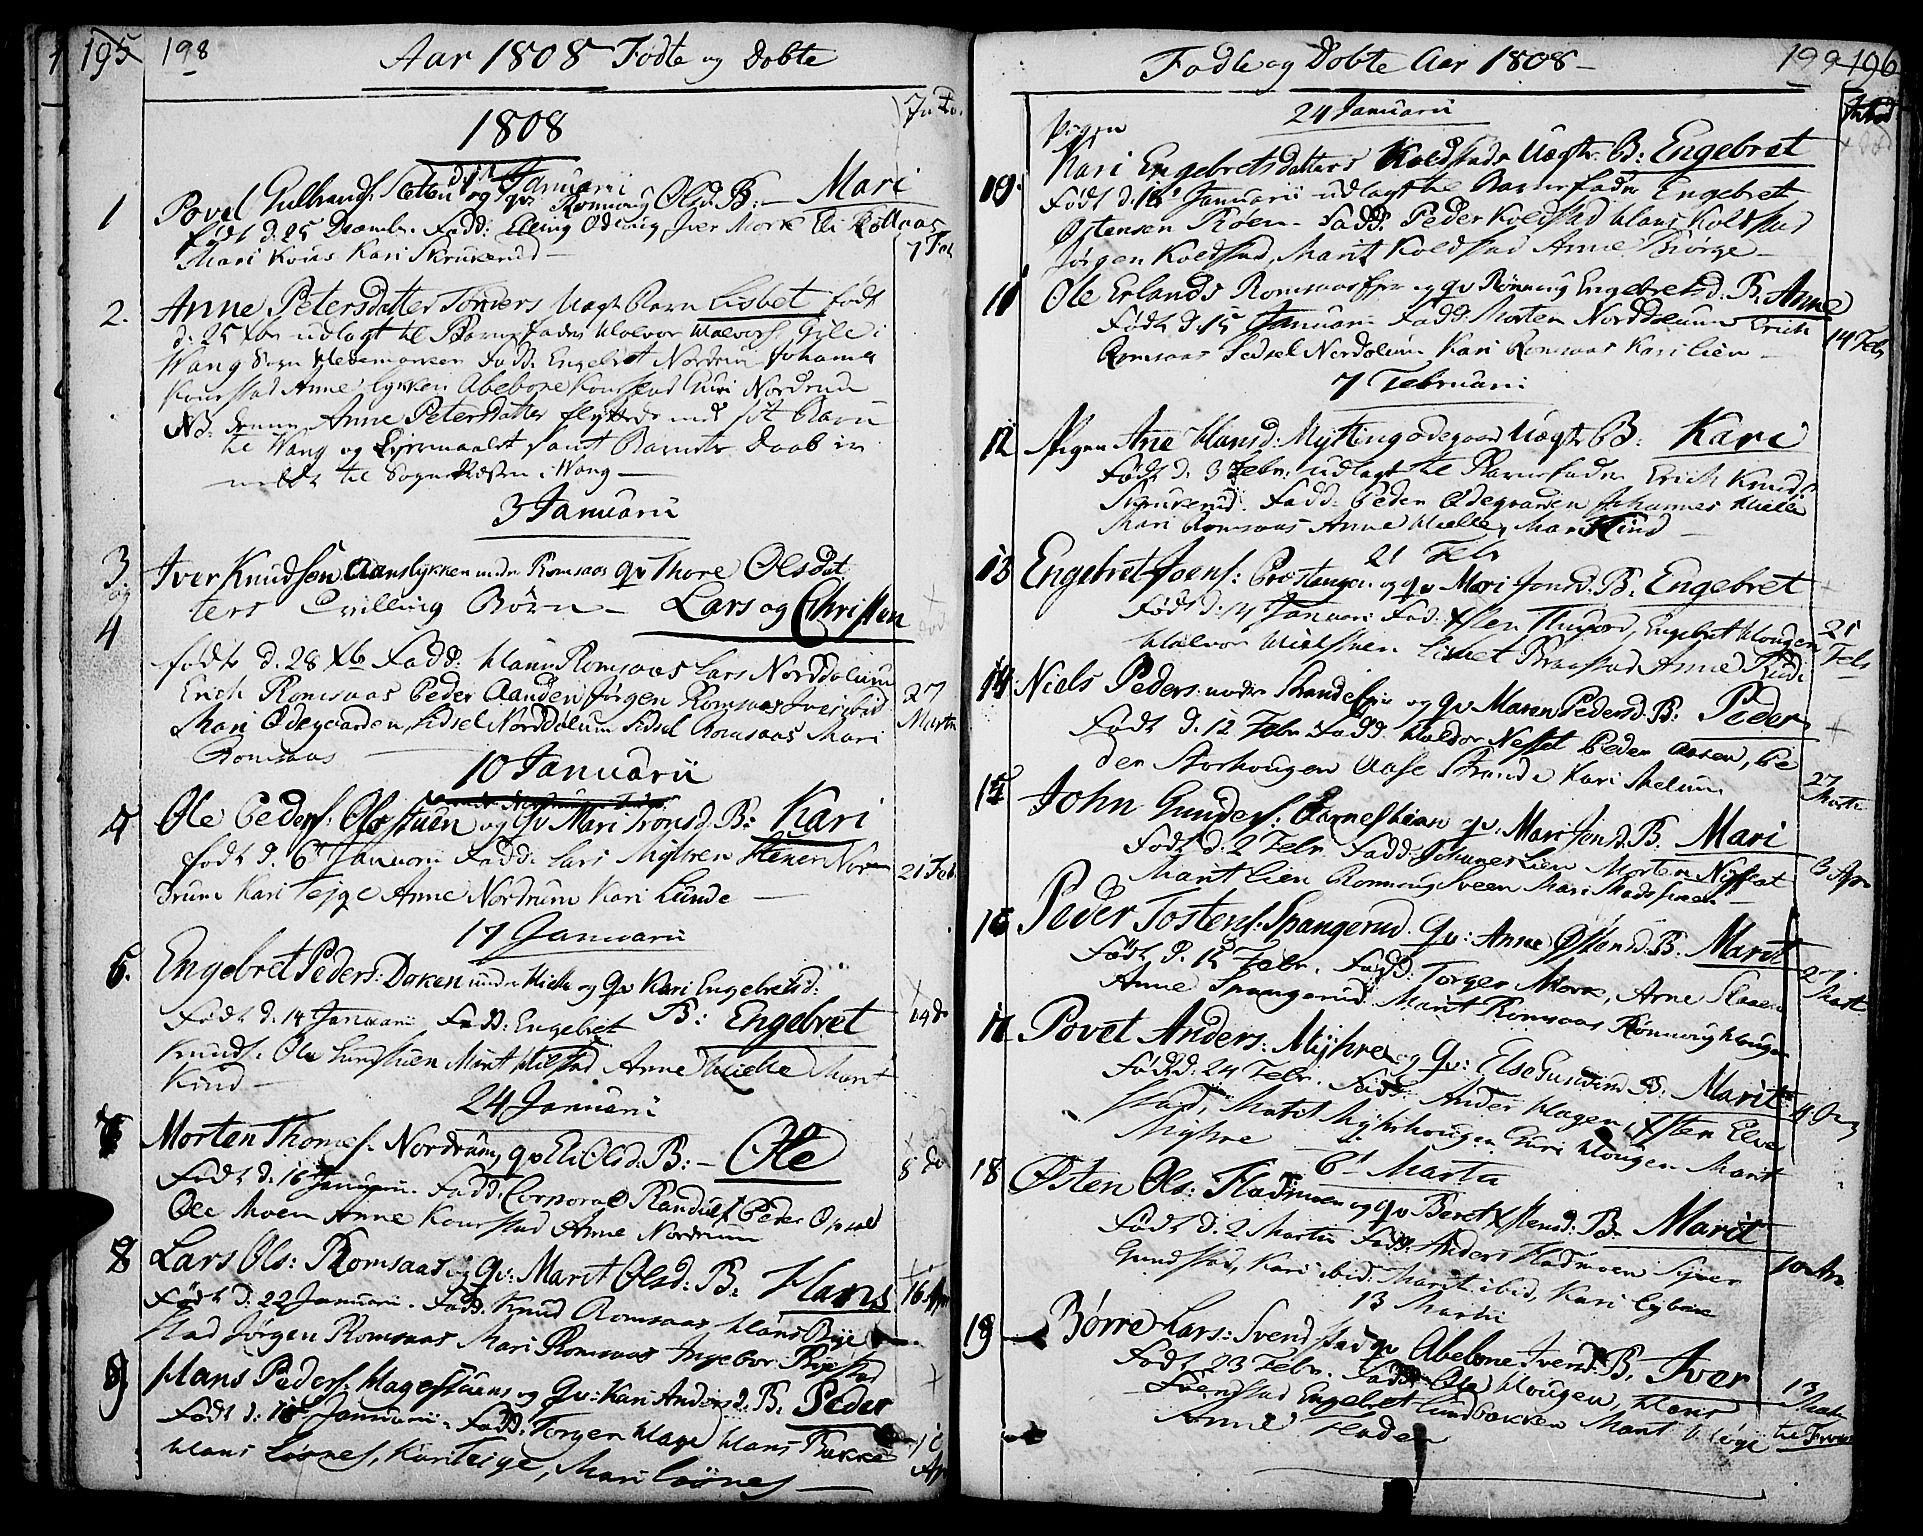 SAH, Ringebu prestekontor, Ministerialbok nr. 3, 1781-1820, s. 198-199